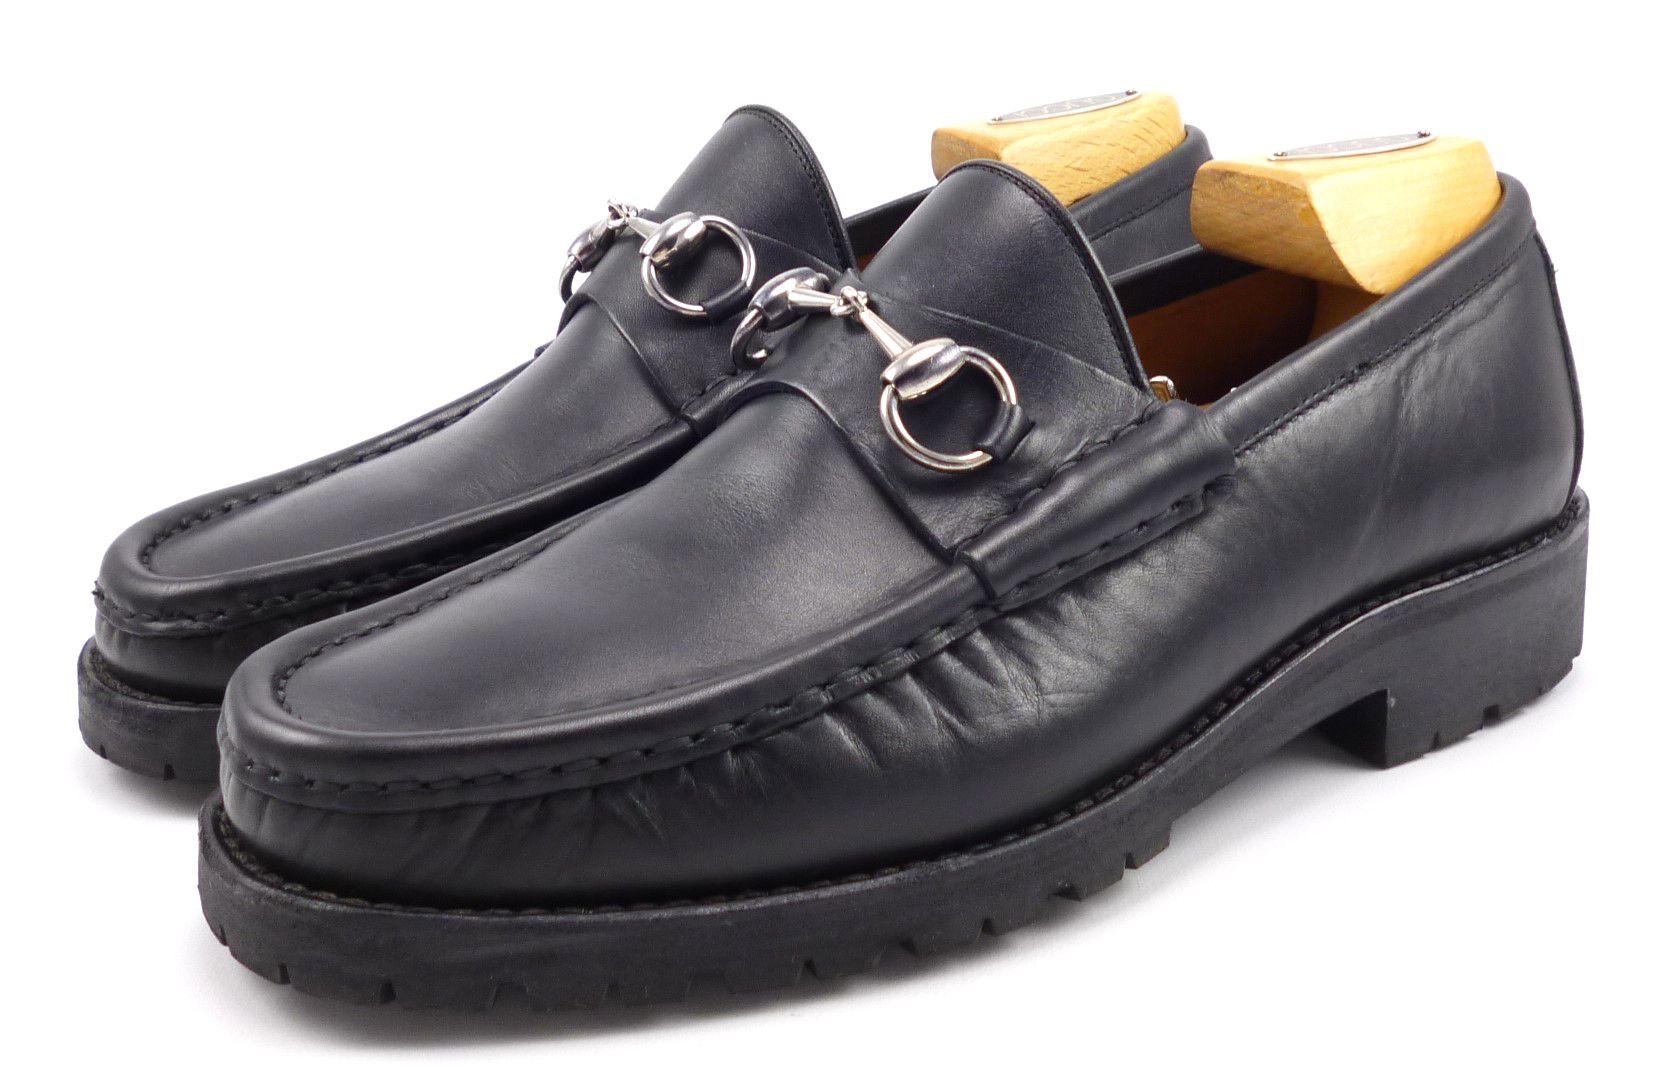 a5b6f773a6d Gucci Mens Designer Shoes 7.5 Leather Lug Sole Horse Bit Loafers 016343  Black